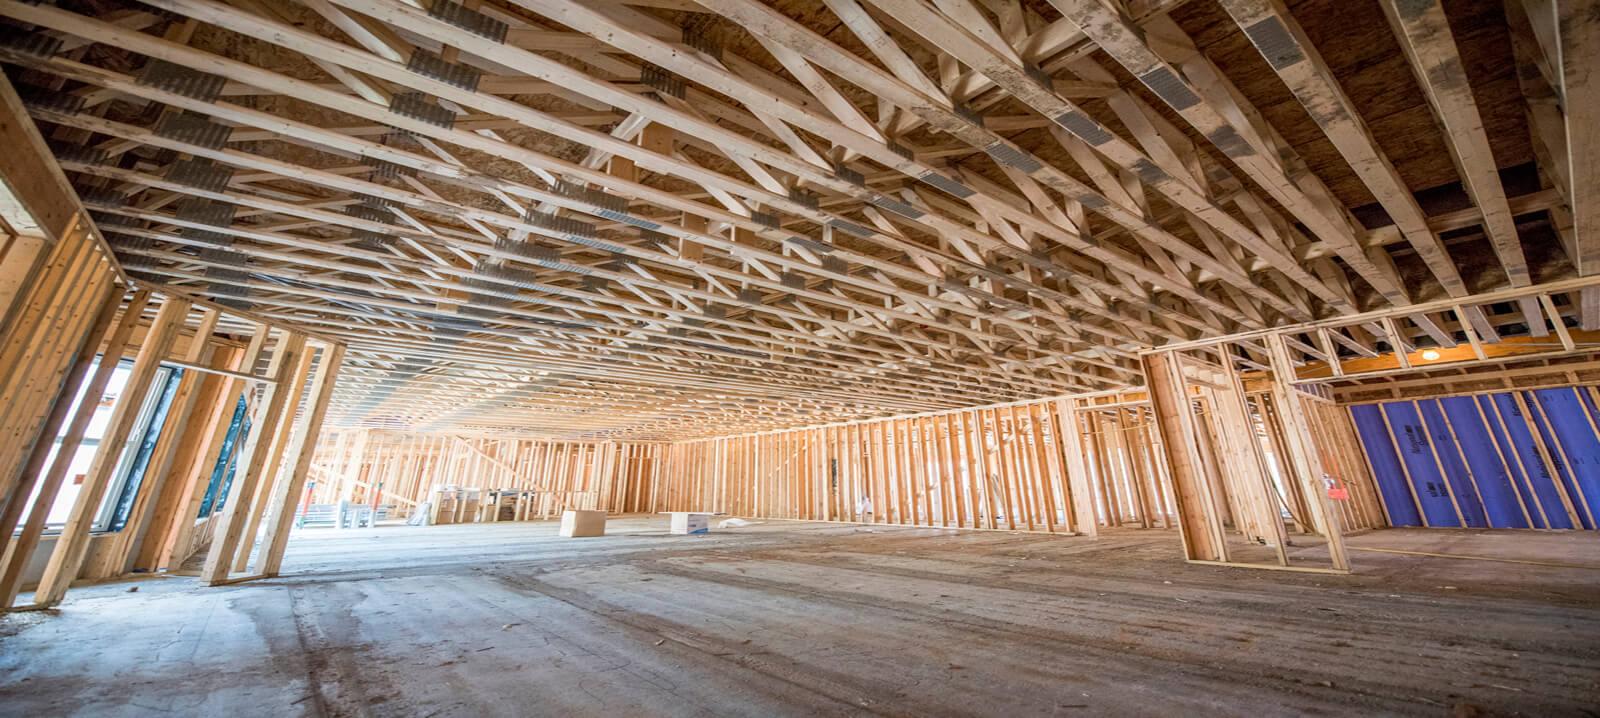 St. Anthony Park Interior Construction